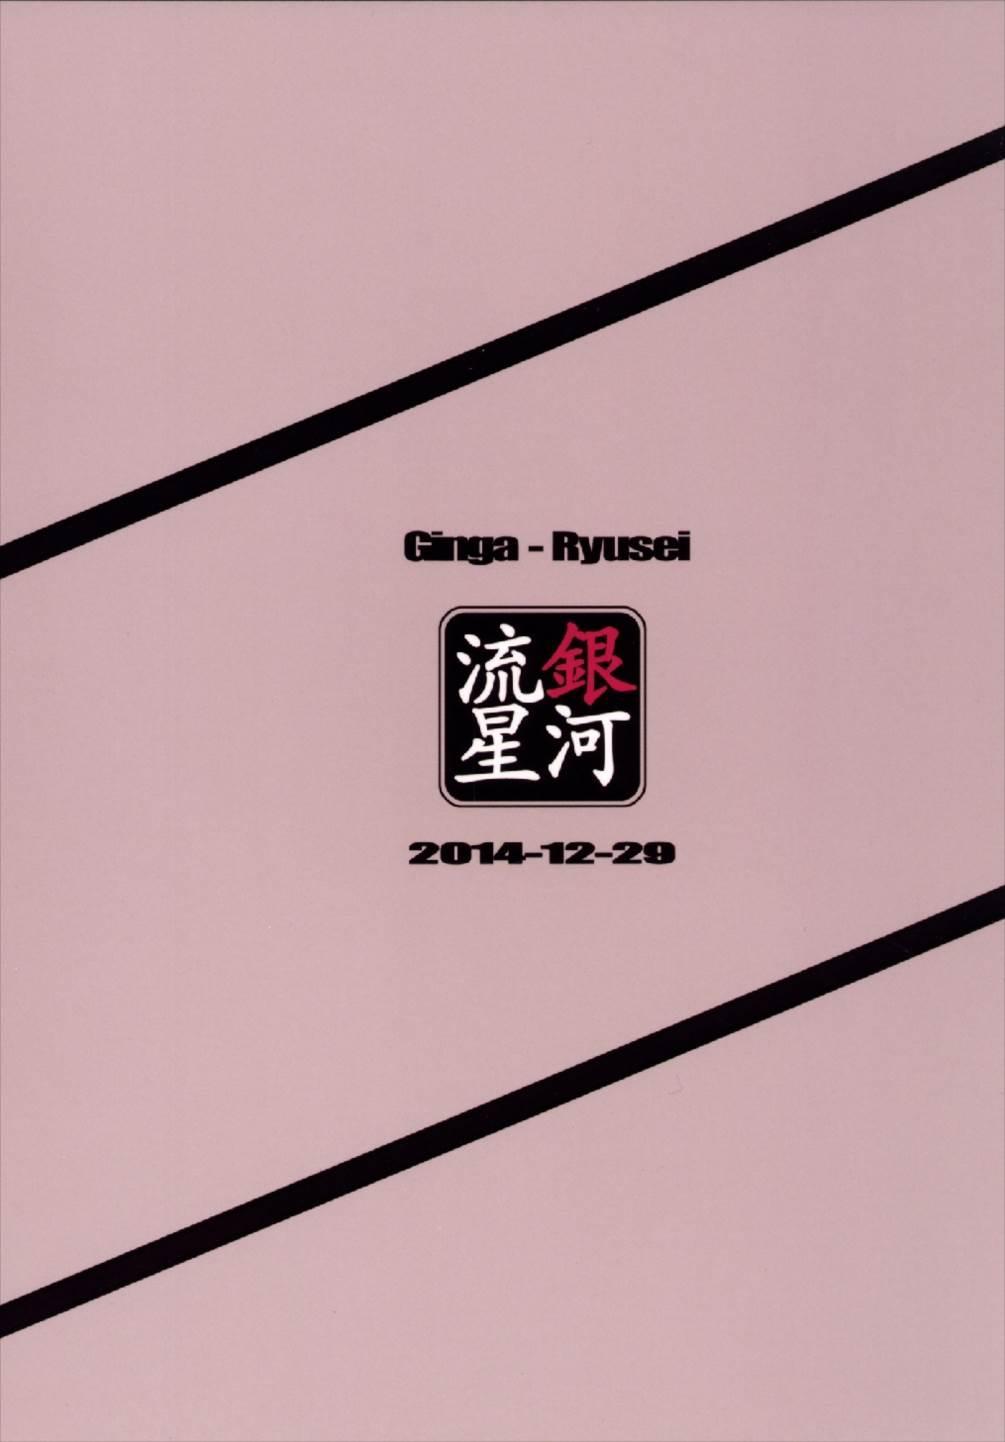 Nagato no Jijou 19